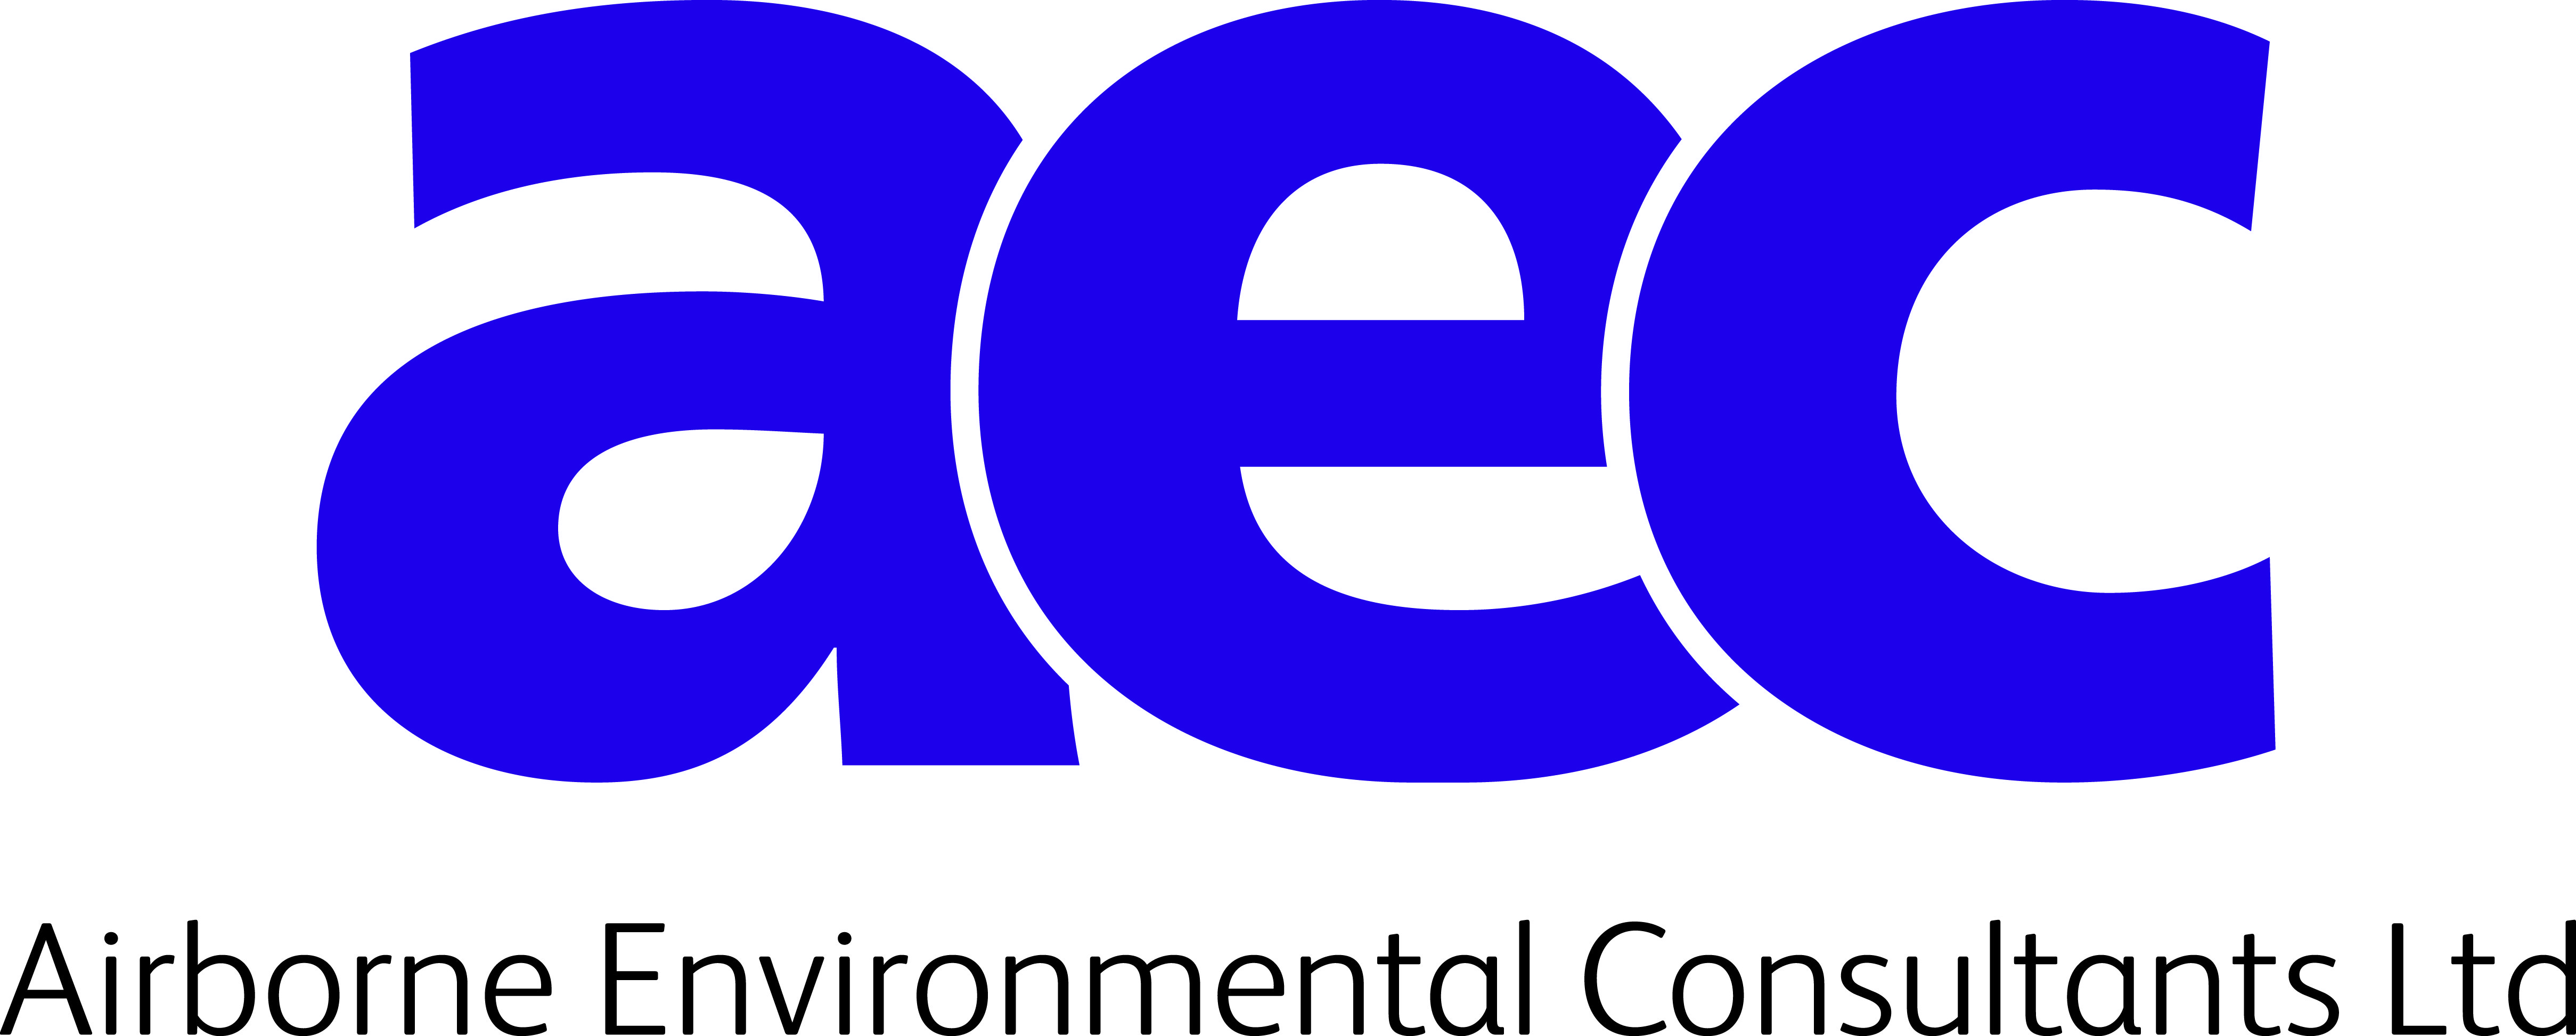 AEC_logo - large high res